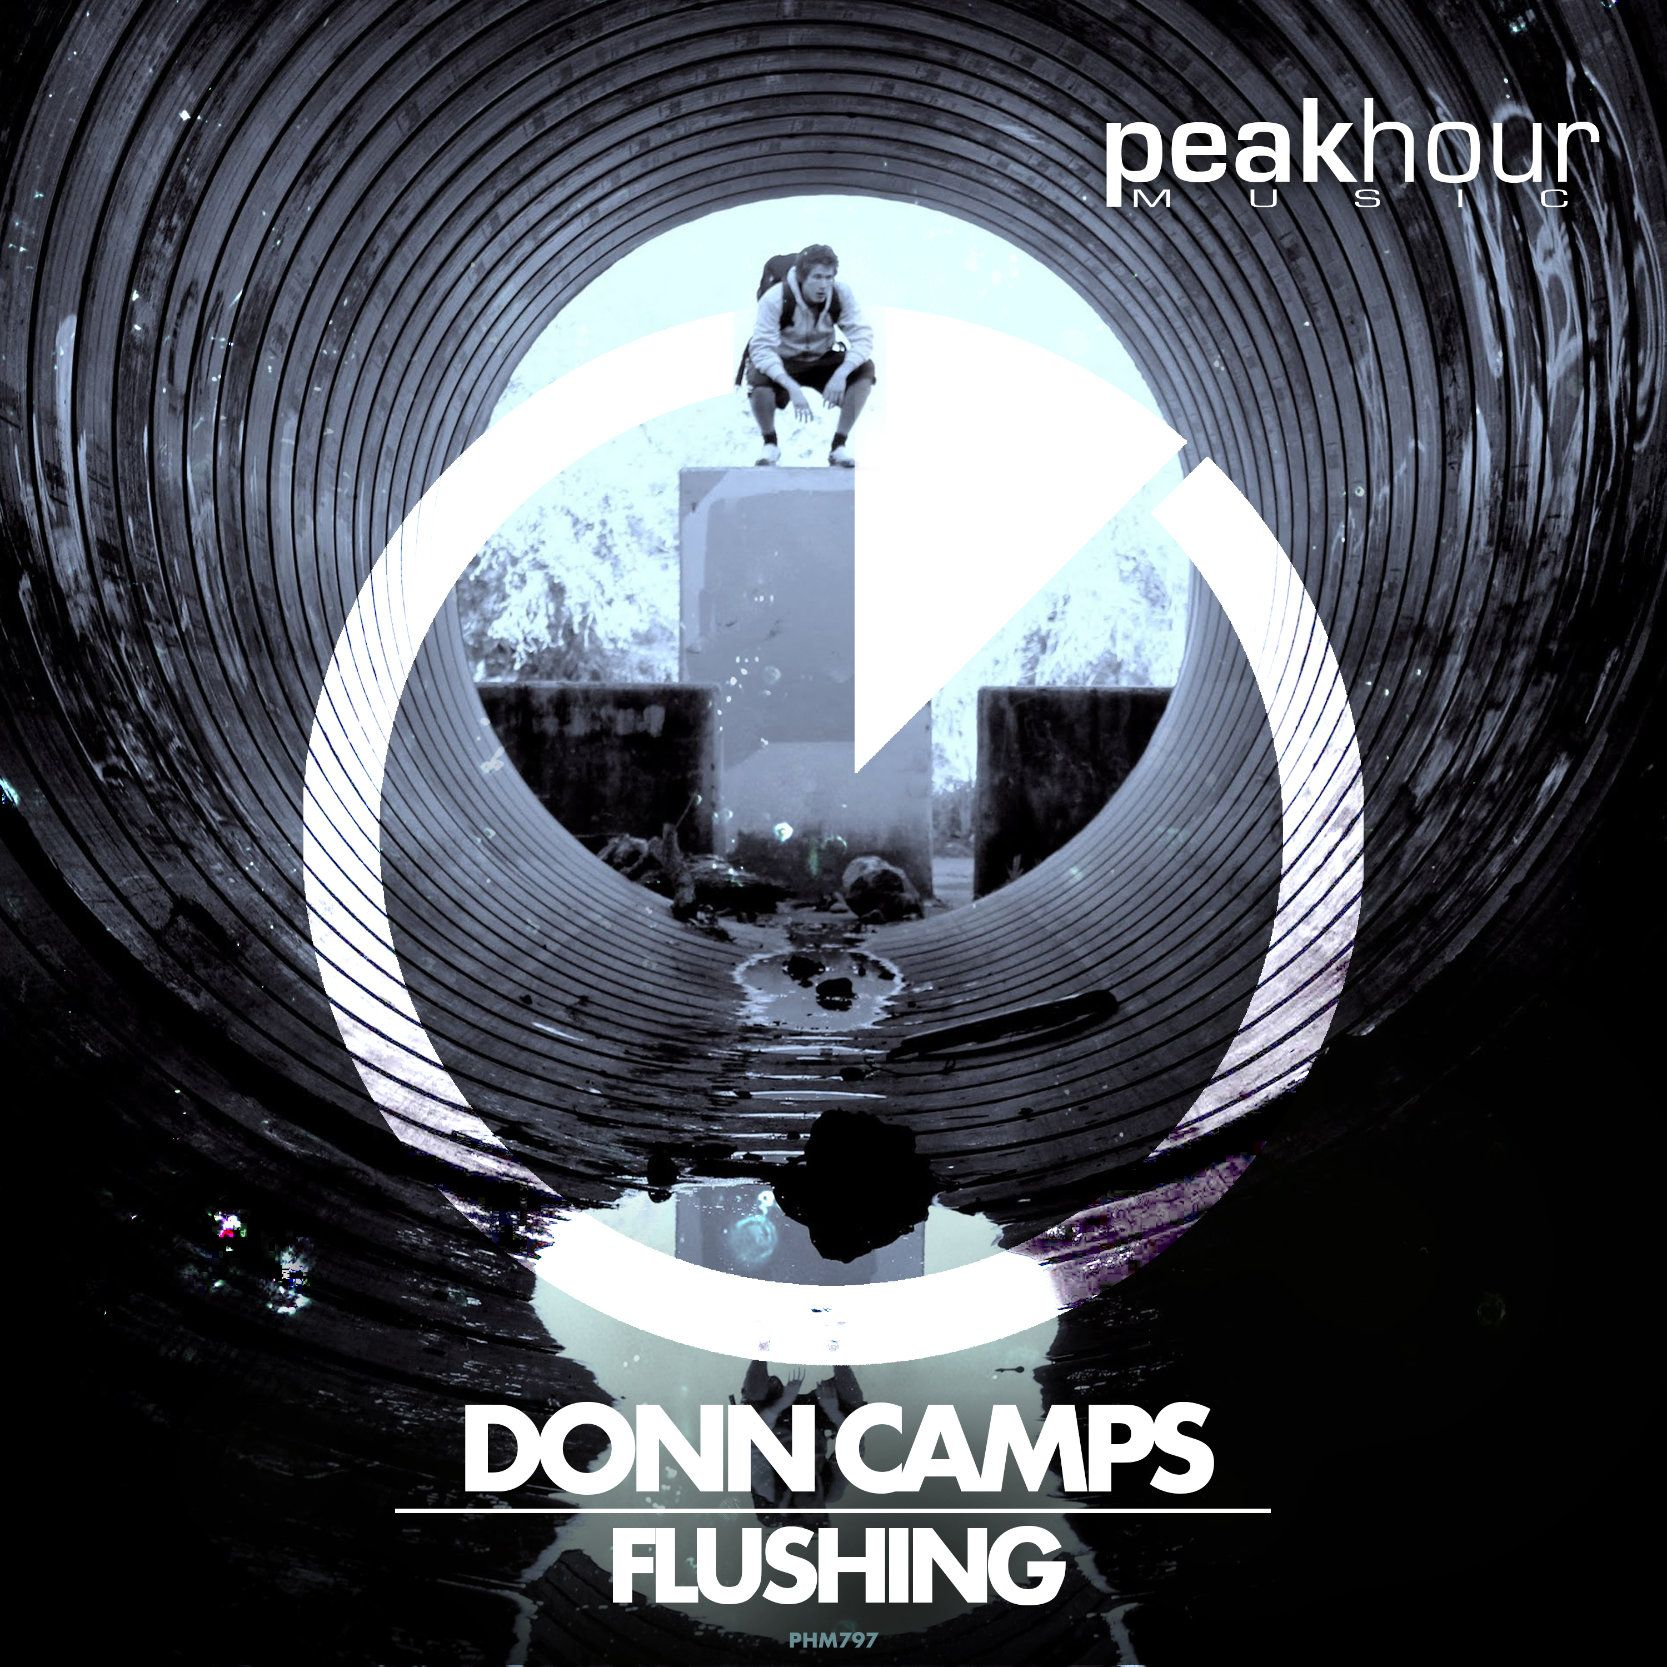 donn_camps_-_flushing_peakhour_music_ihouseu.jpg